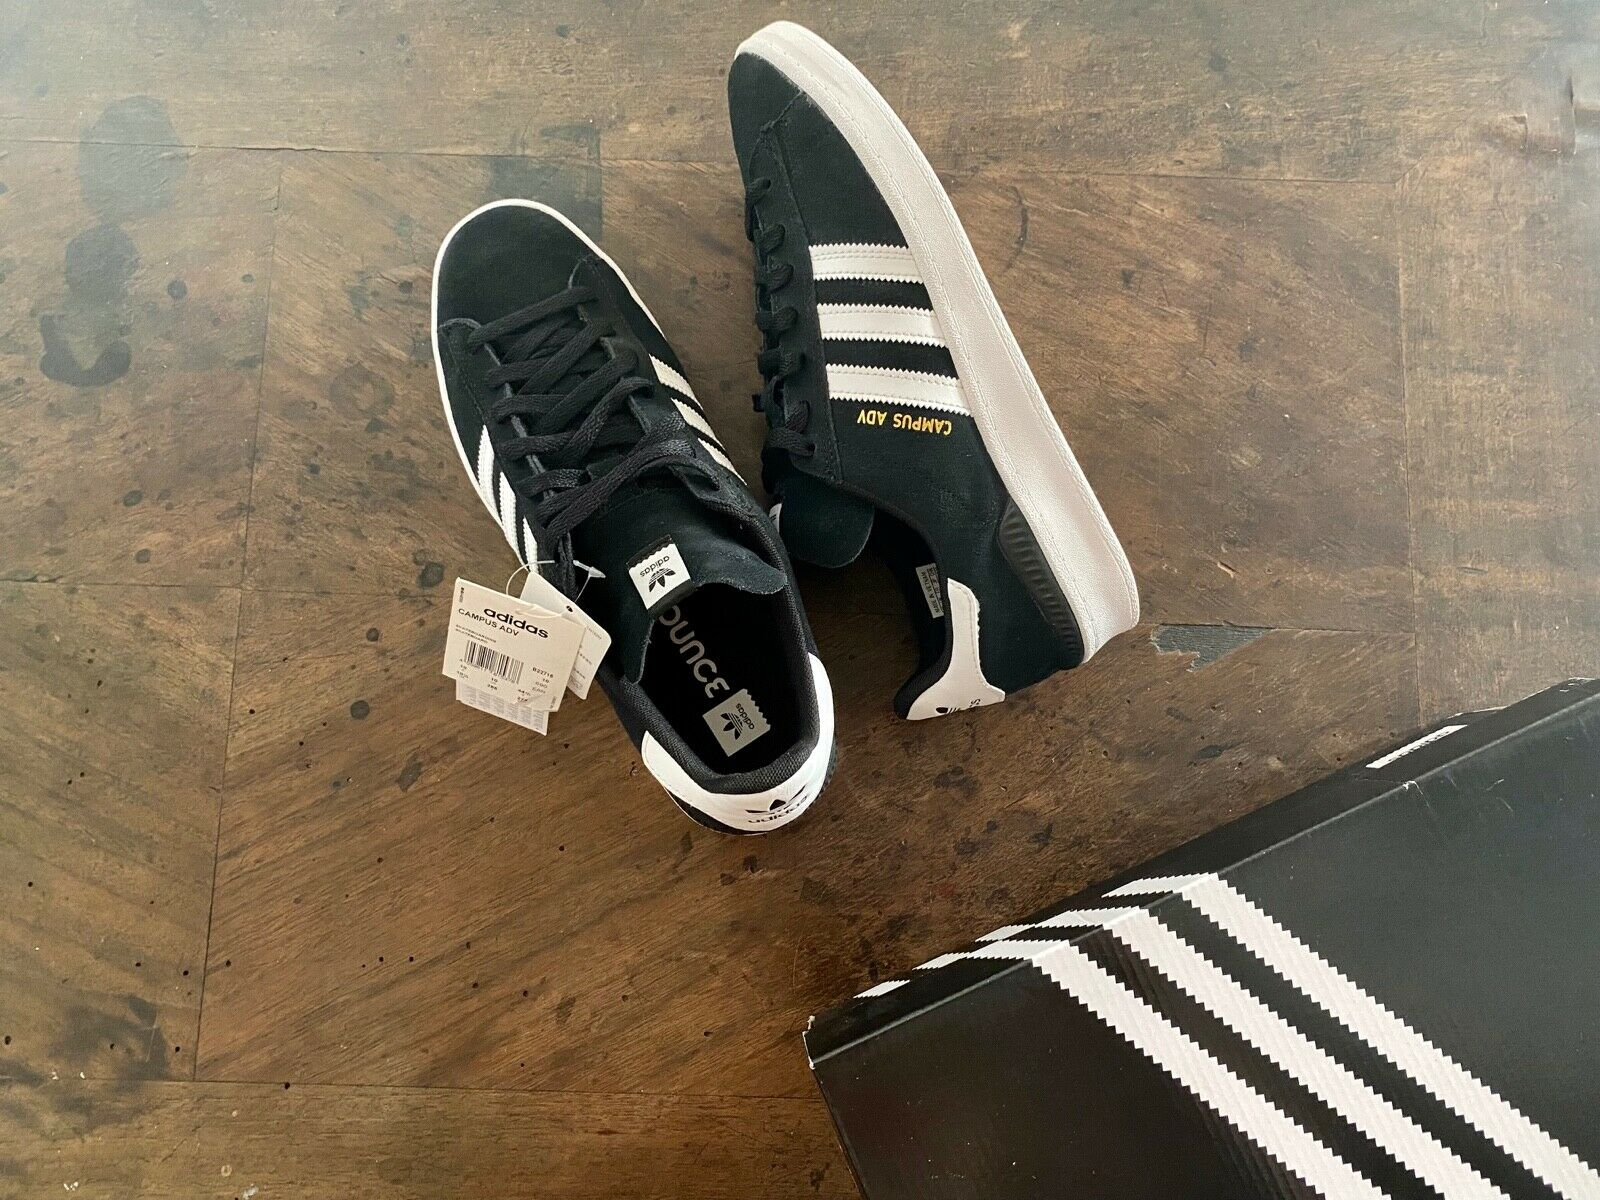 2021 Adidas Campus ADV - zapatilla de skate negra